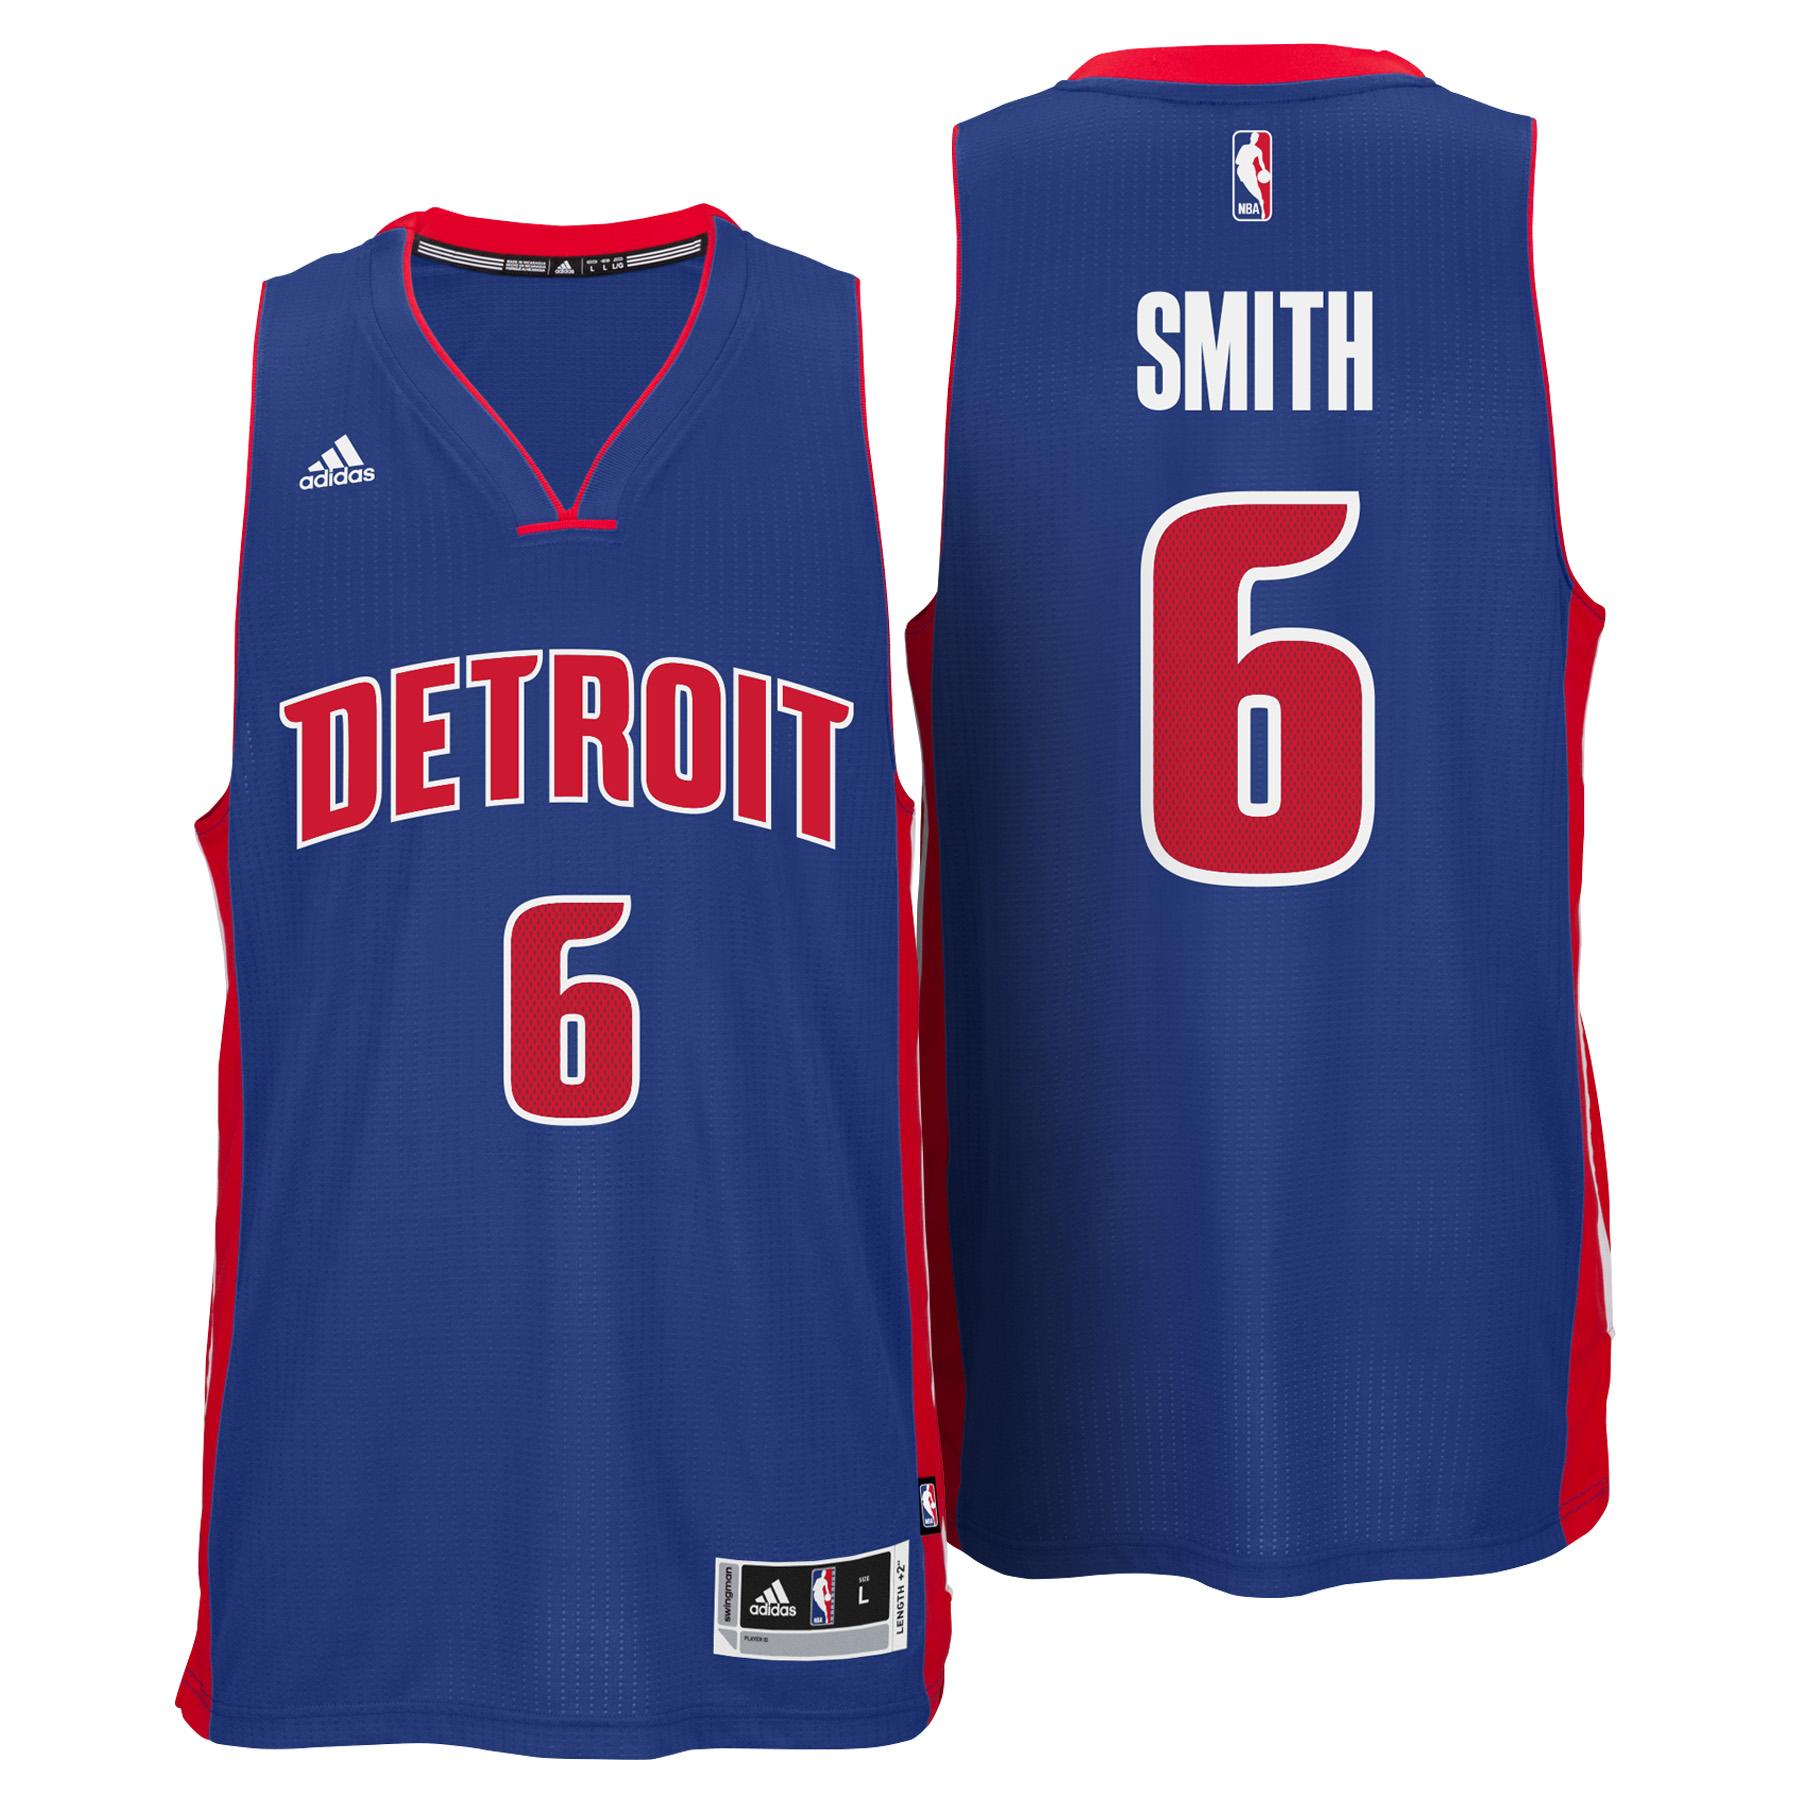 Detroit Pistons Road Swingman Jersey - Josh Smith - Mens